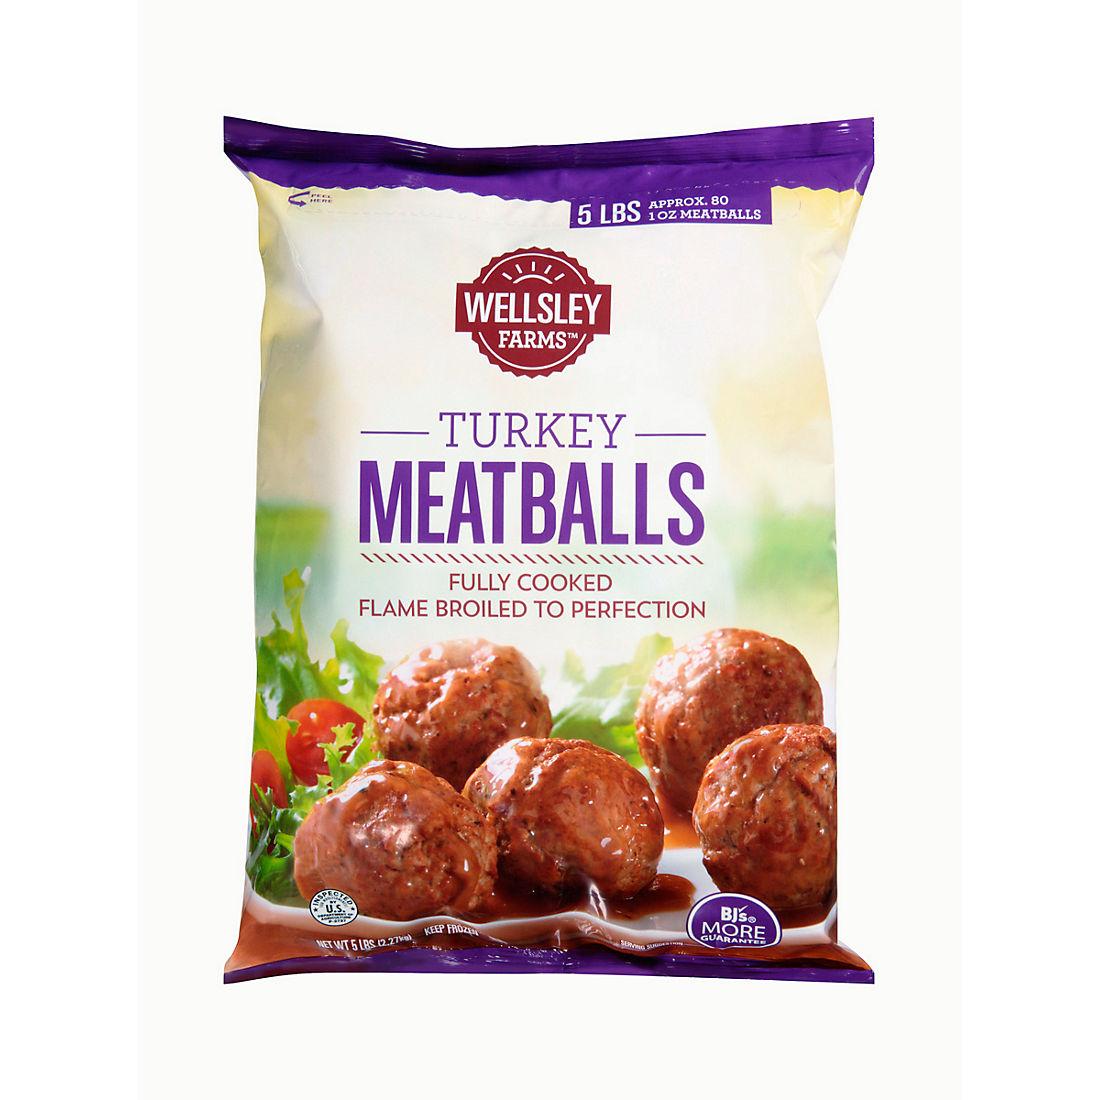 Wellsley Farms Turkey Meatballs, 5 lbs  - BJs WholeSale Club